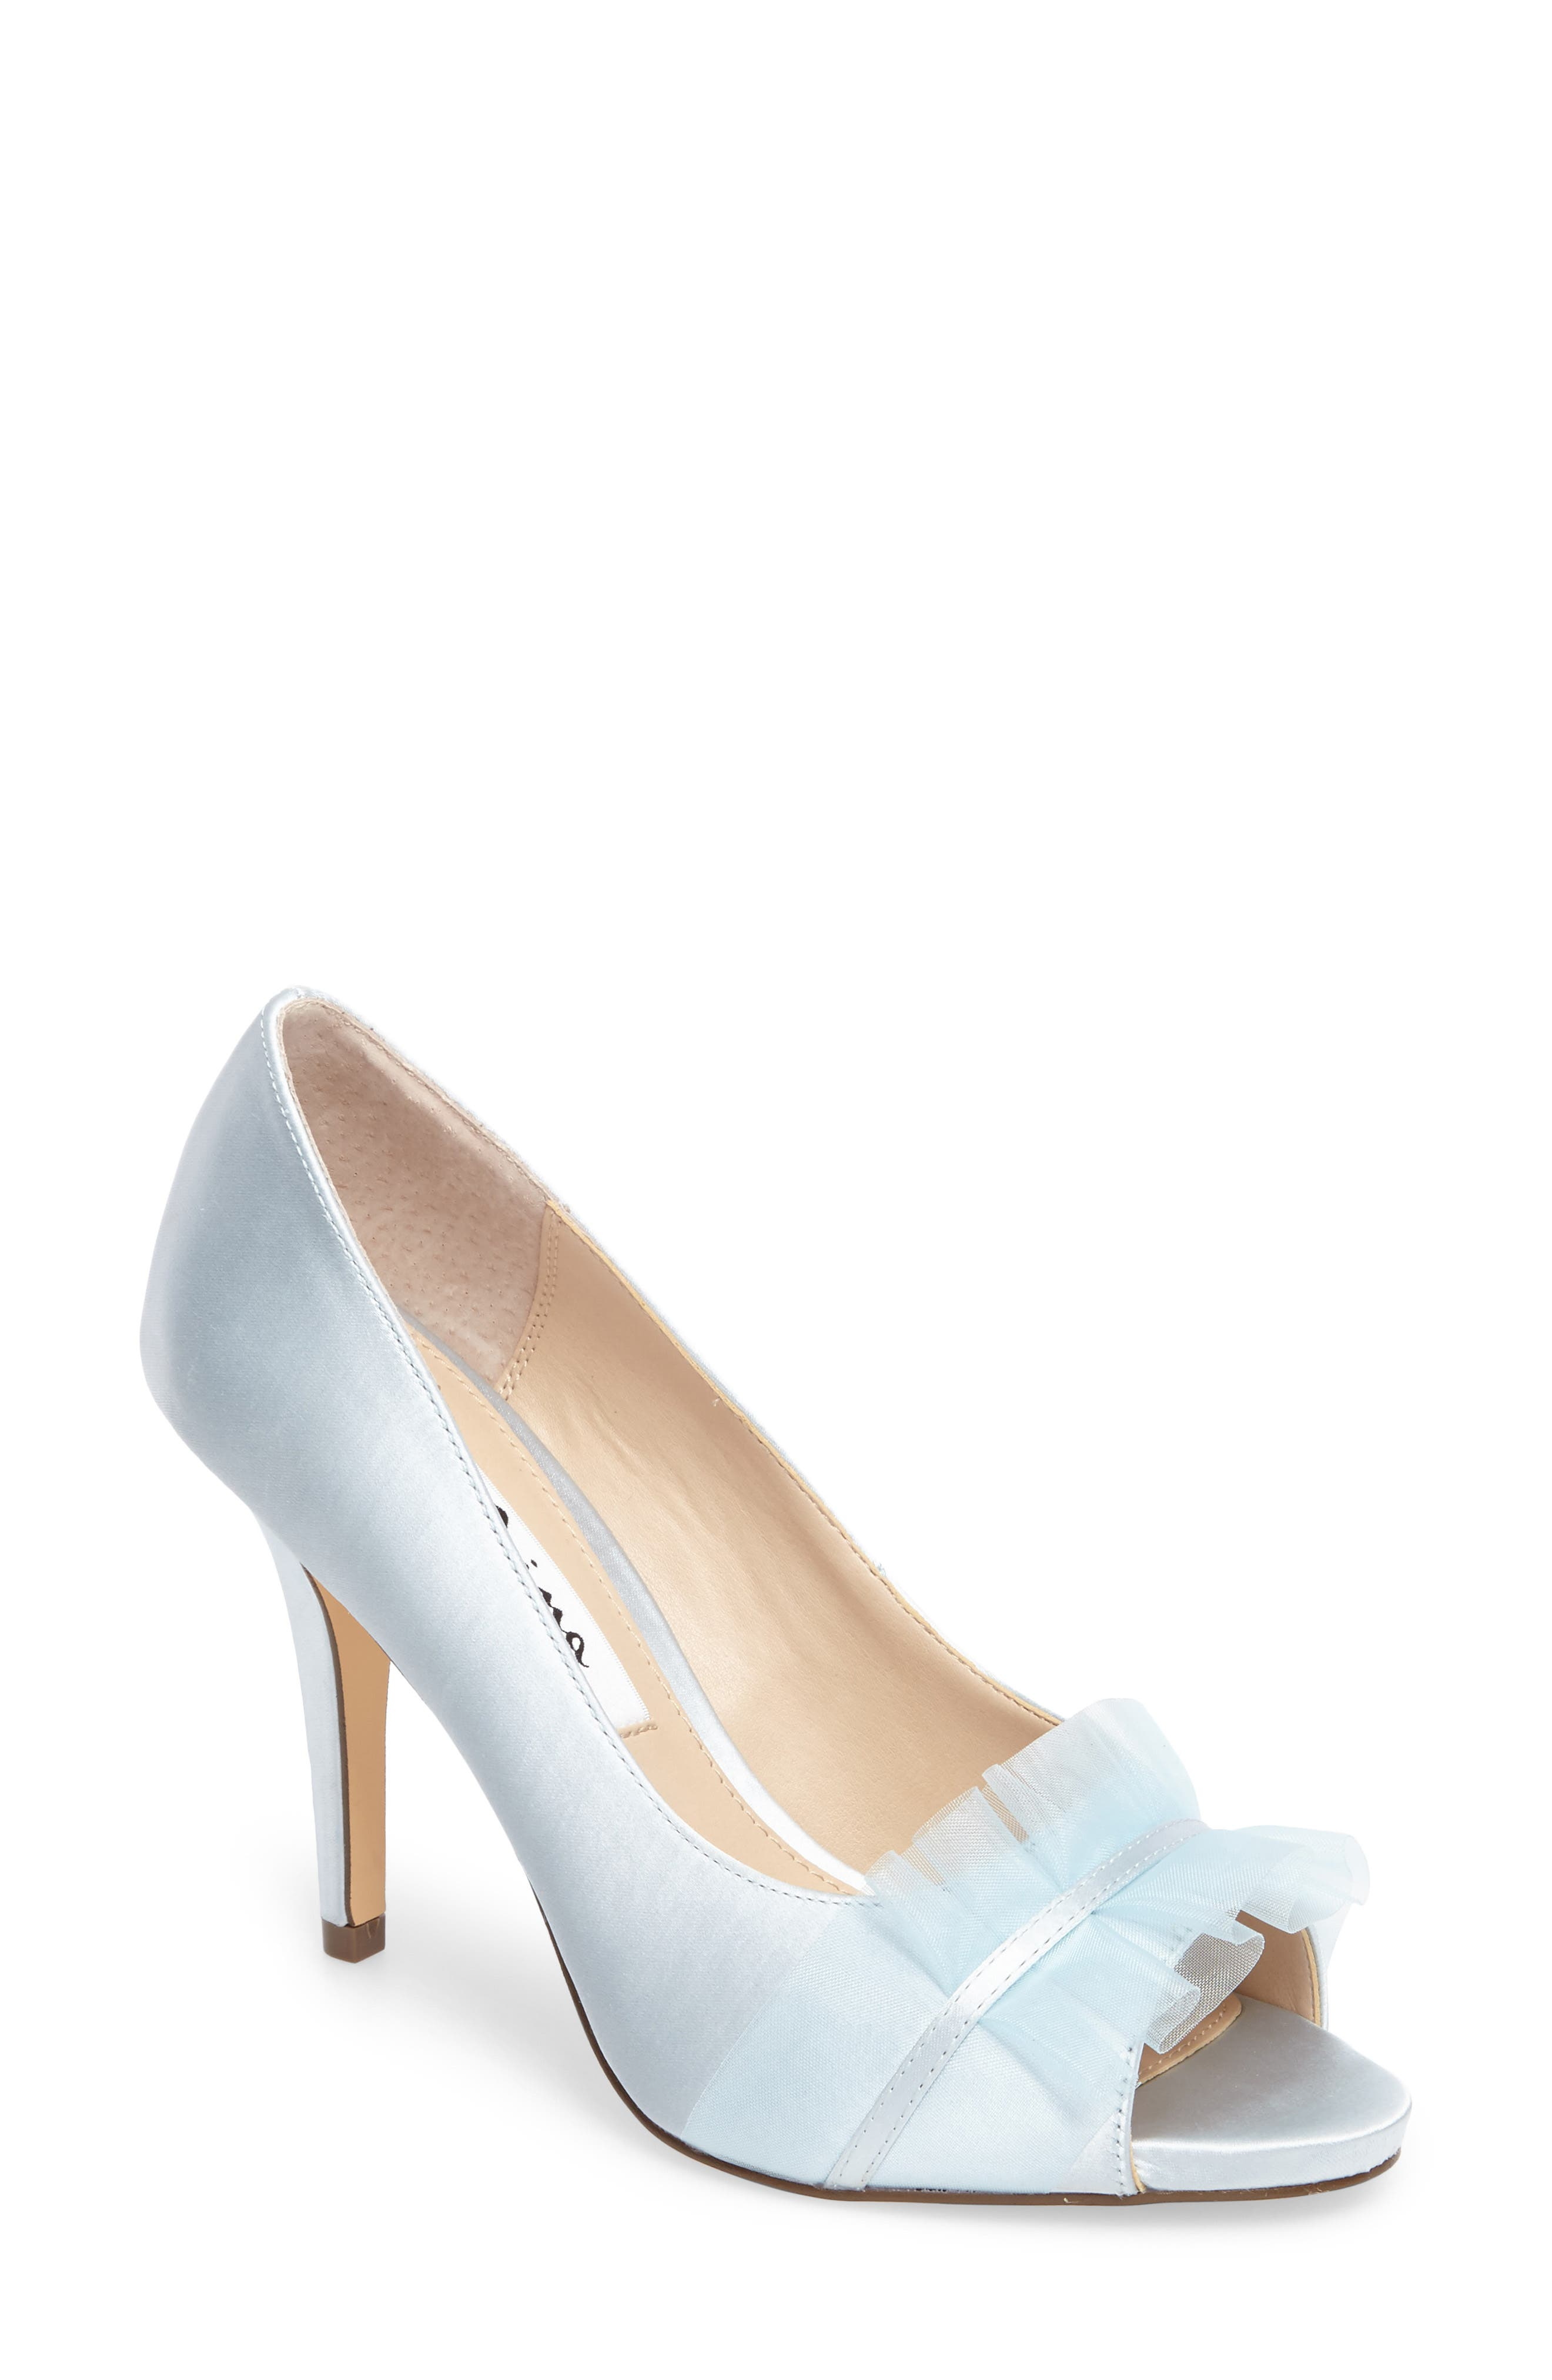 8afcf1592f1 Nina Raizel Ruffle Open Toe Pump In Blue Satin